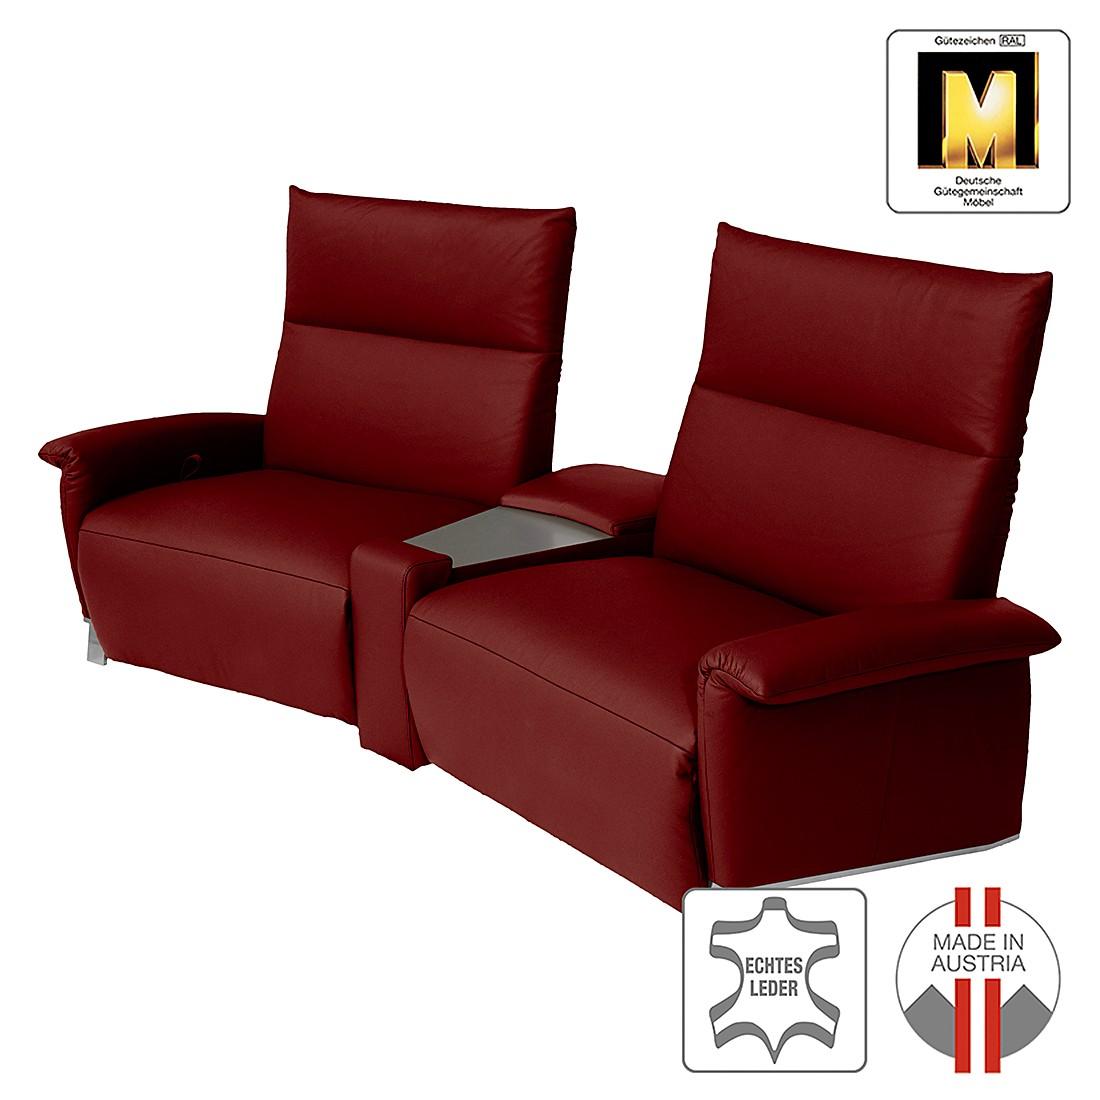 Reclinersofa Barcelona (2-Sitzer) – Echtleder – Rot, ADA premium günstig kaufen